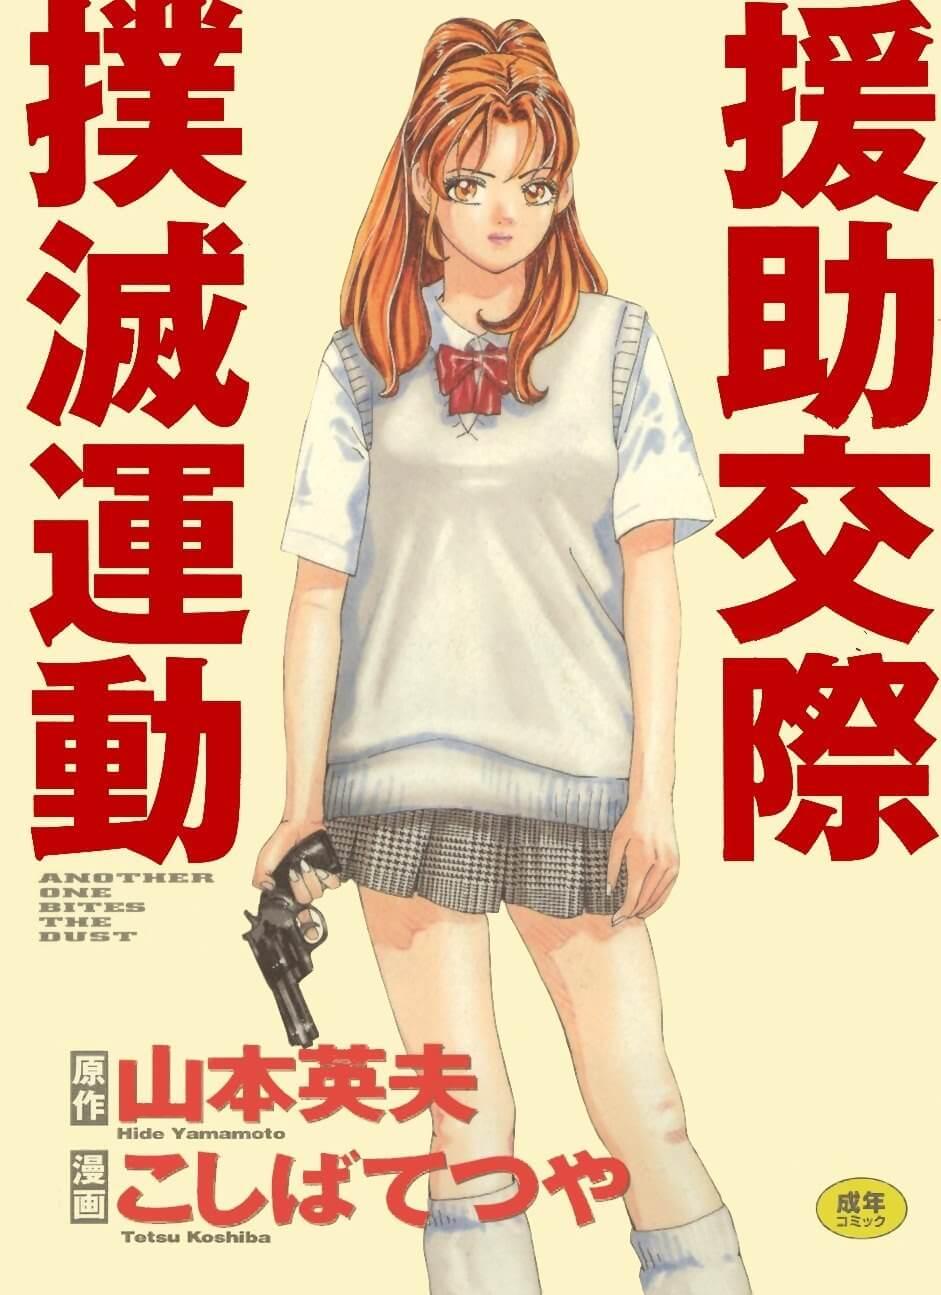 Descargar manga de Enjokousai Bokumetsu Undou en PDF por Mediafire